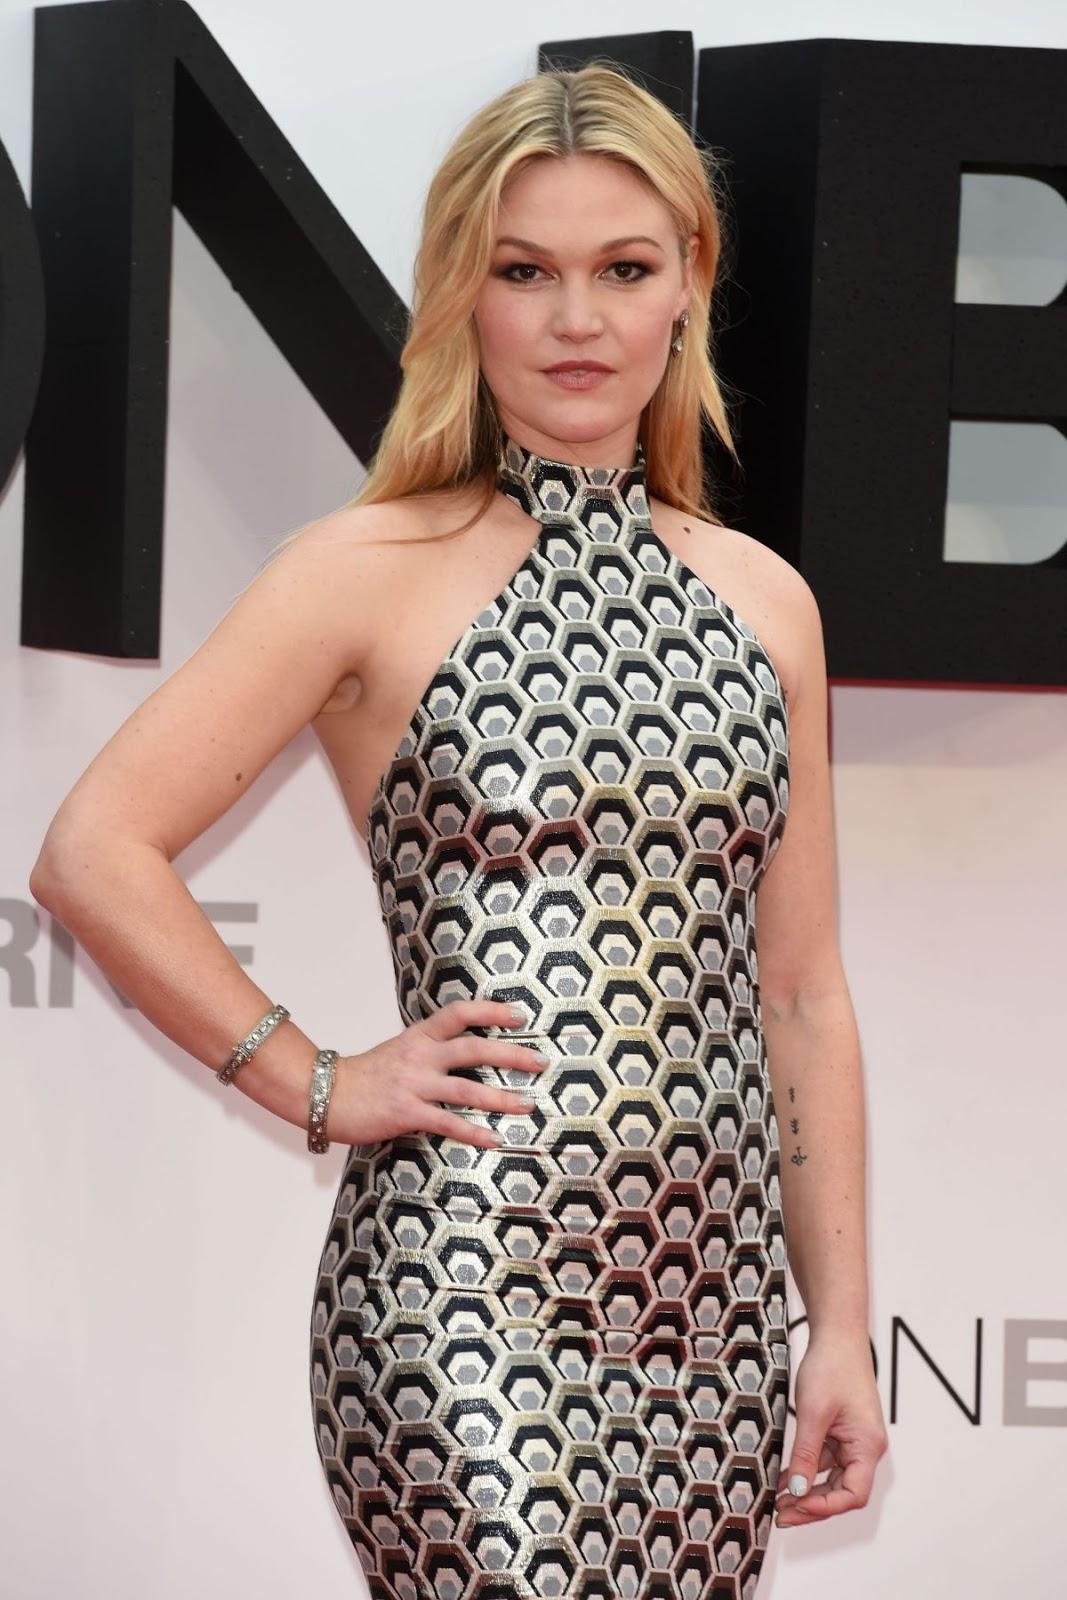 'Jason Bourne' actress Julia Stiles at Jason Bourne London Premiere